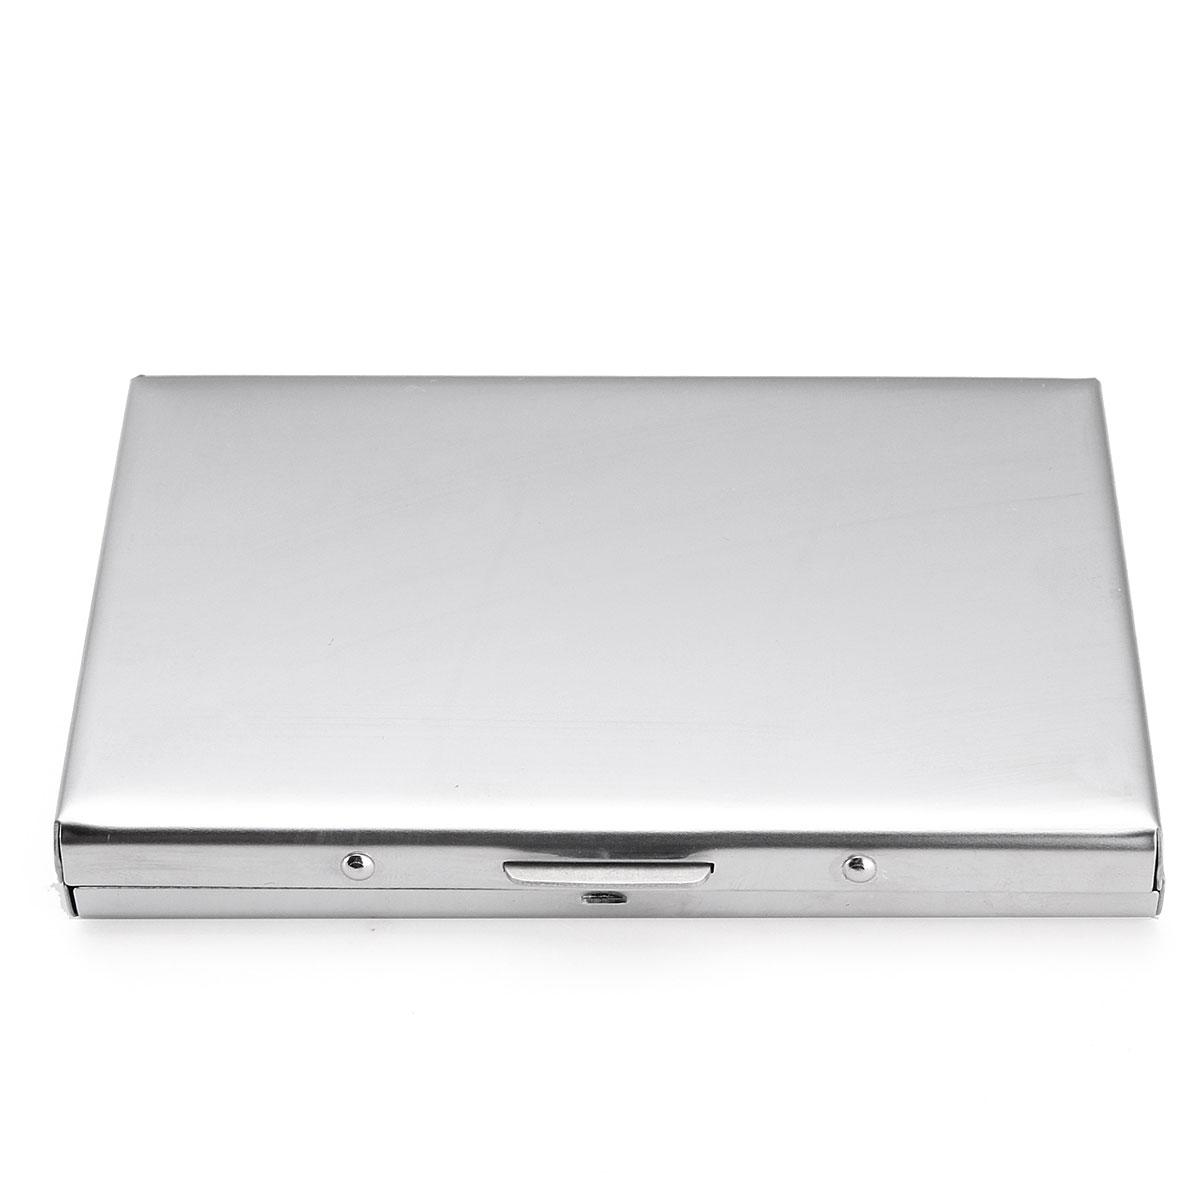 Business Id Credit Card Wallet Holder Aluminum Metal Pocket Case Box Walet Black Soap Original Diamond Image